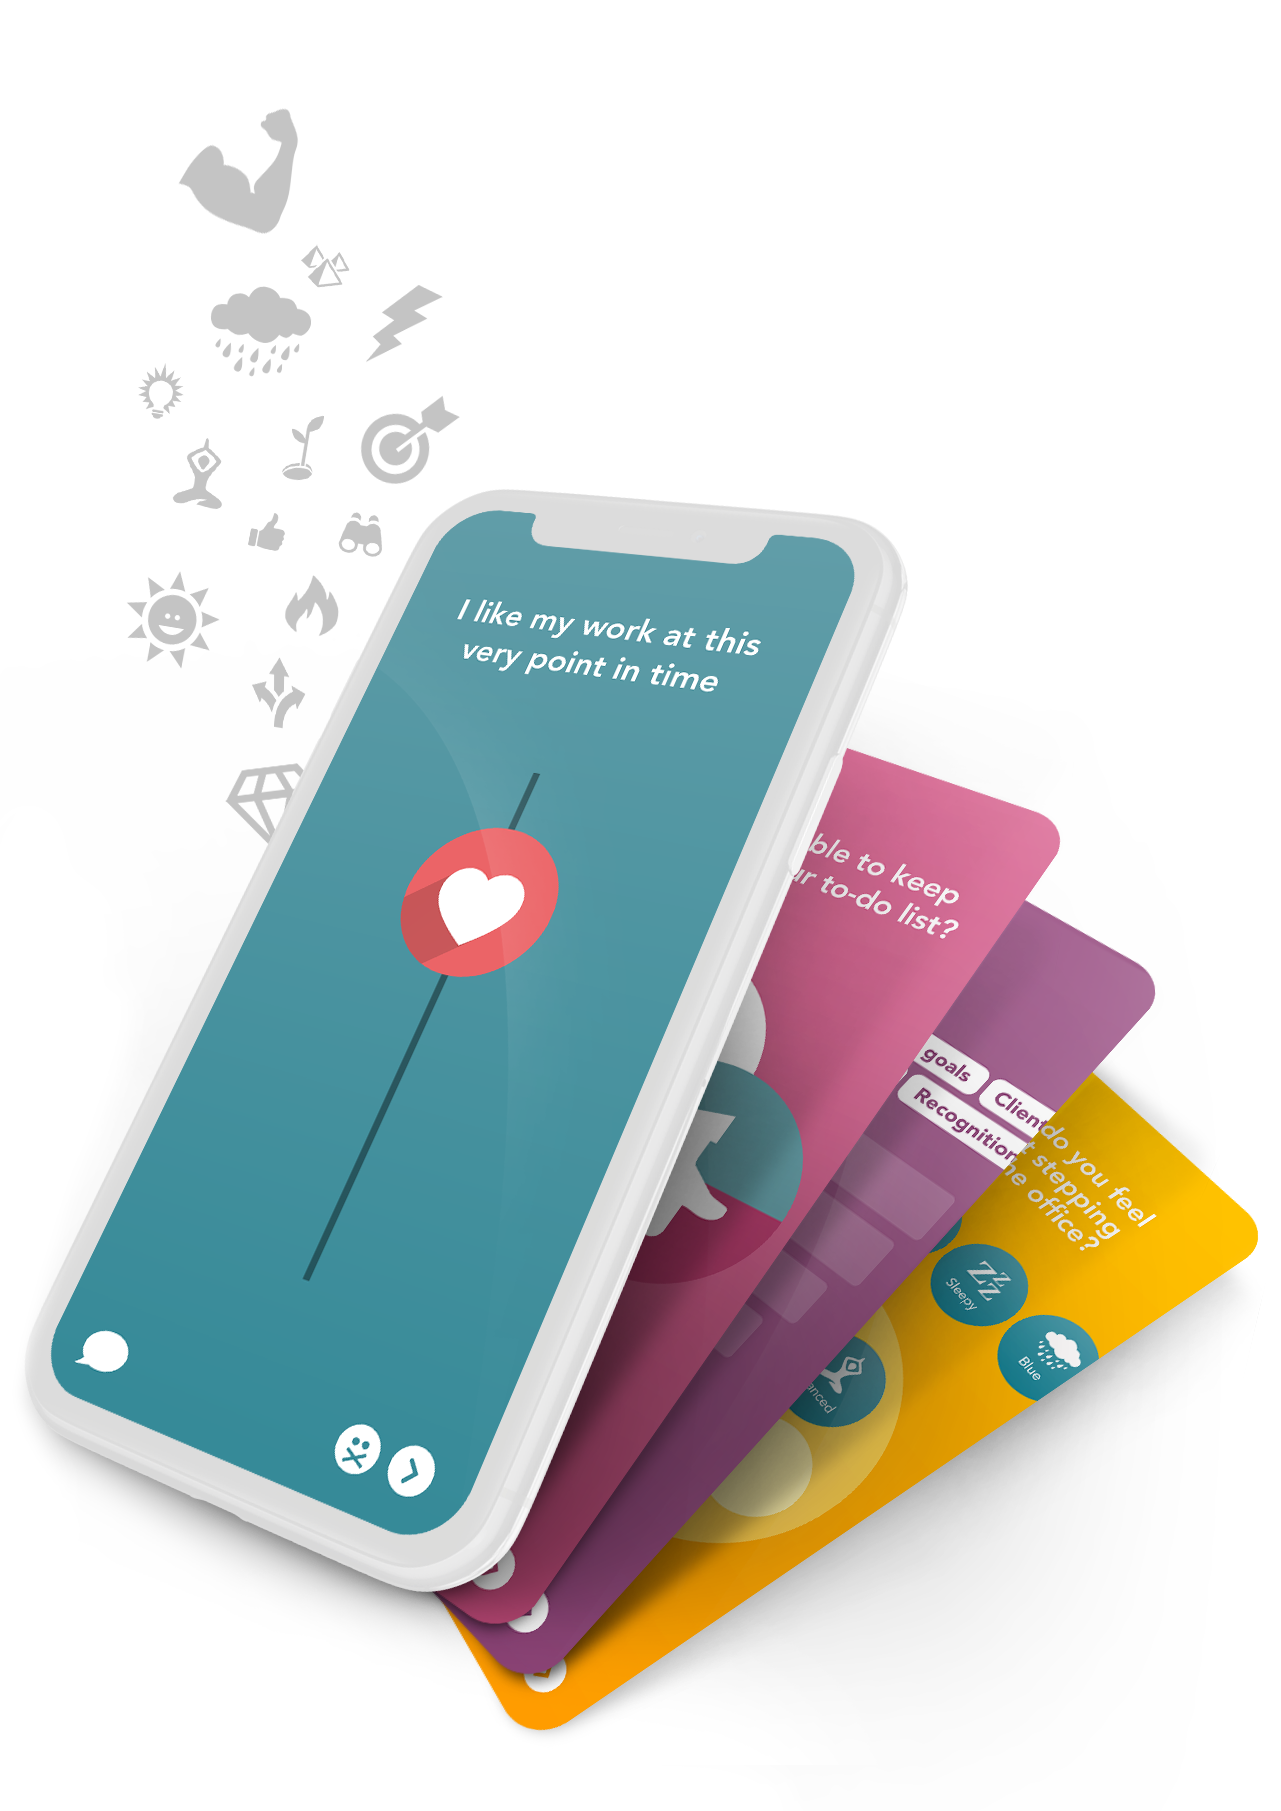 MobileFlowEnglish